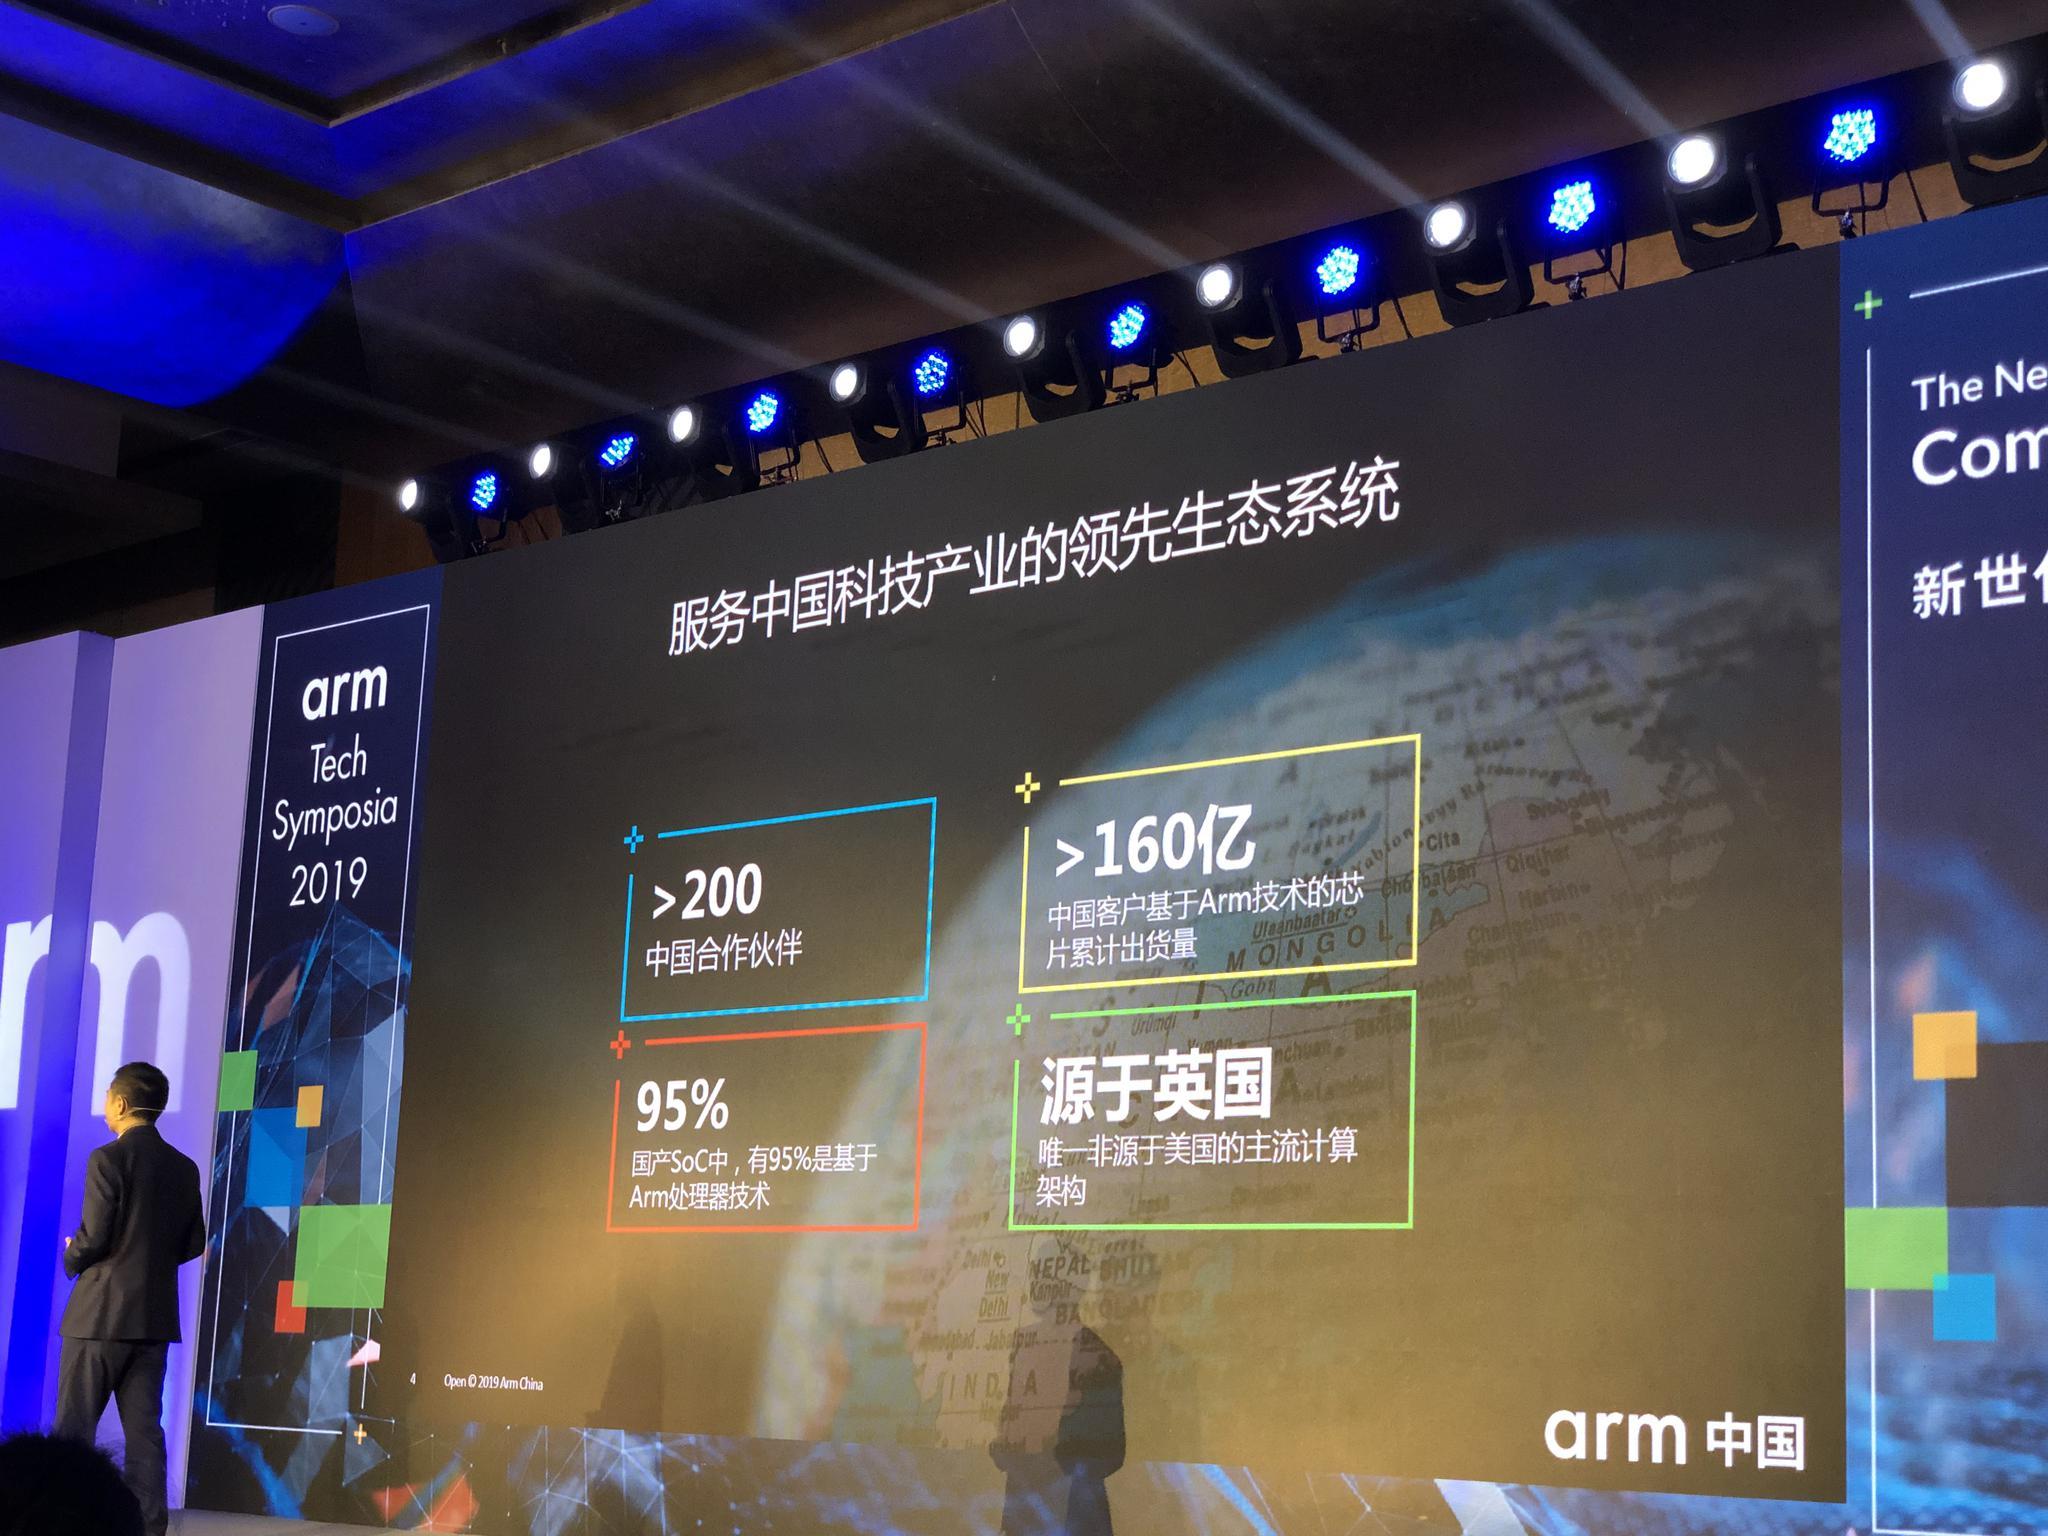 Arm中国公布调查结果:技术源自英国 继续向中企授权